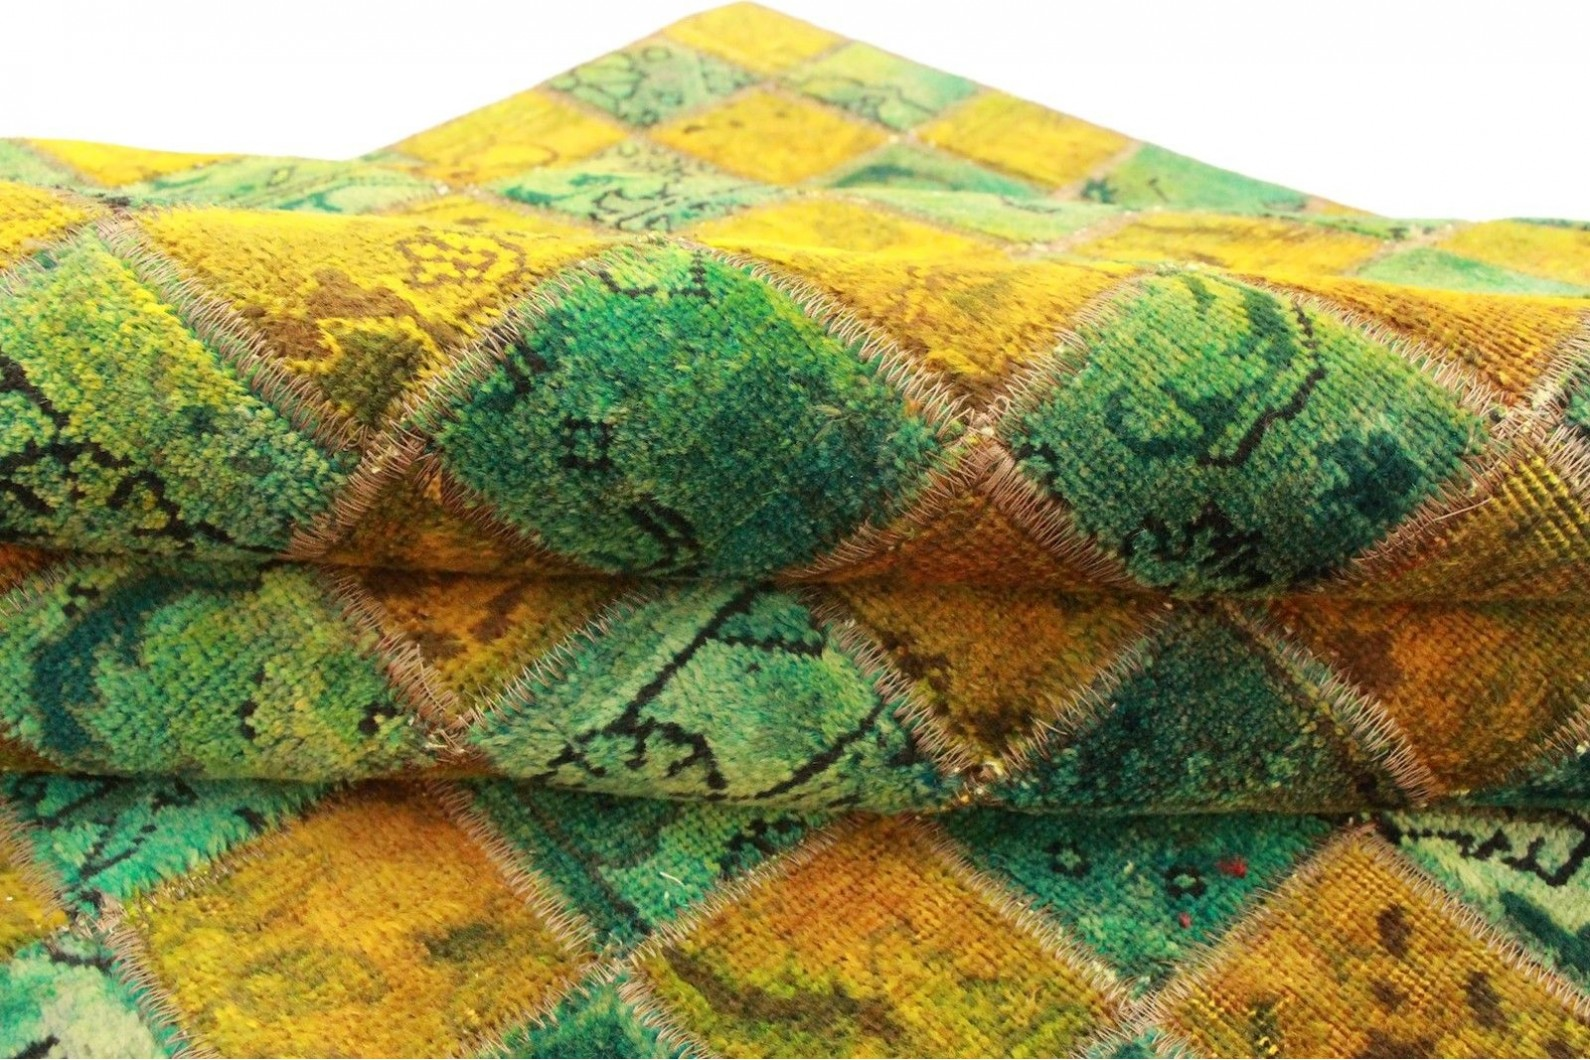 patchwork teppich gr n t rkis gold in 210x210cm 1001 2353 bei kaufen. Black Bedroom Furniture Sets. Home Design Ideas